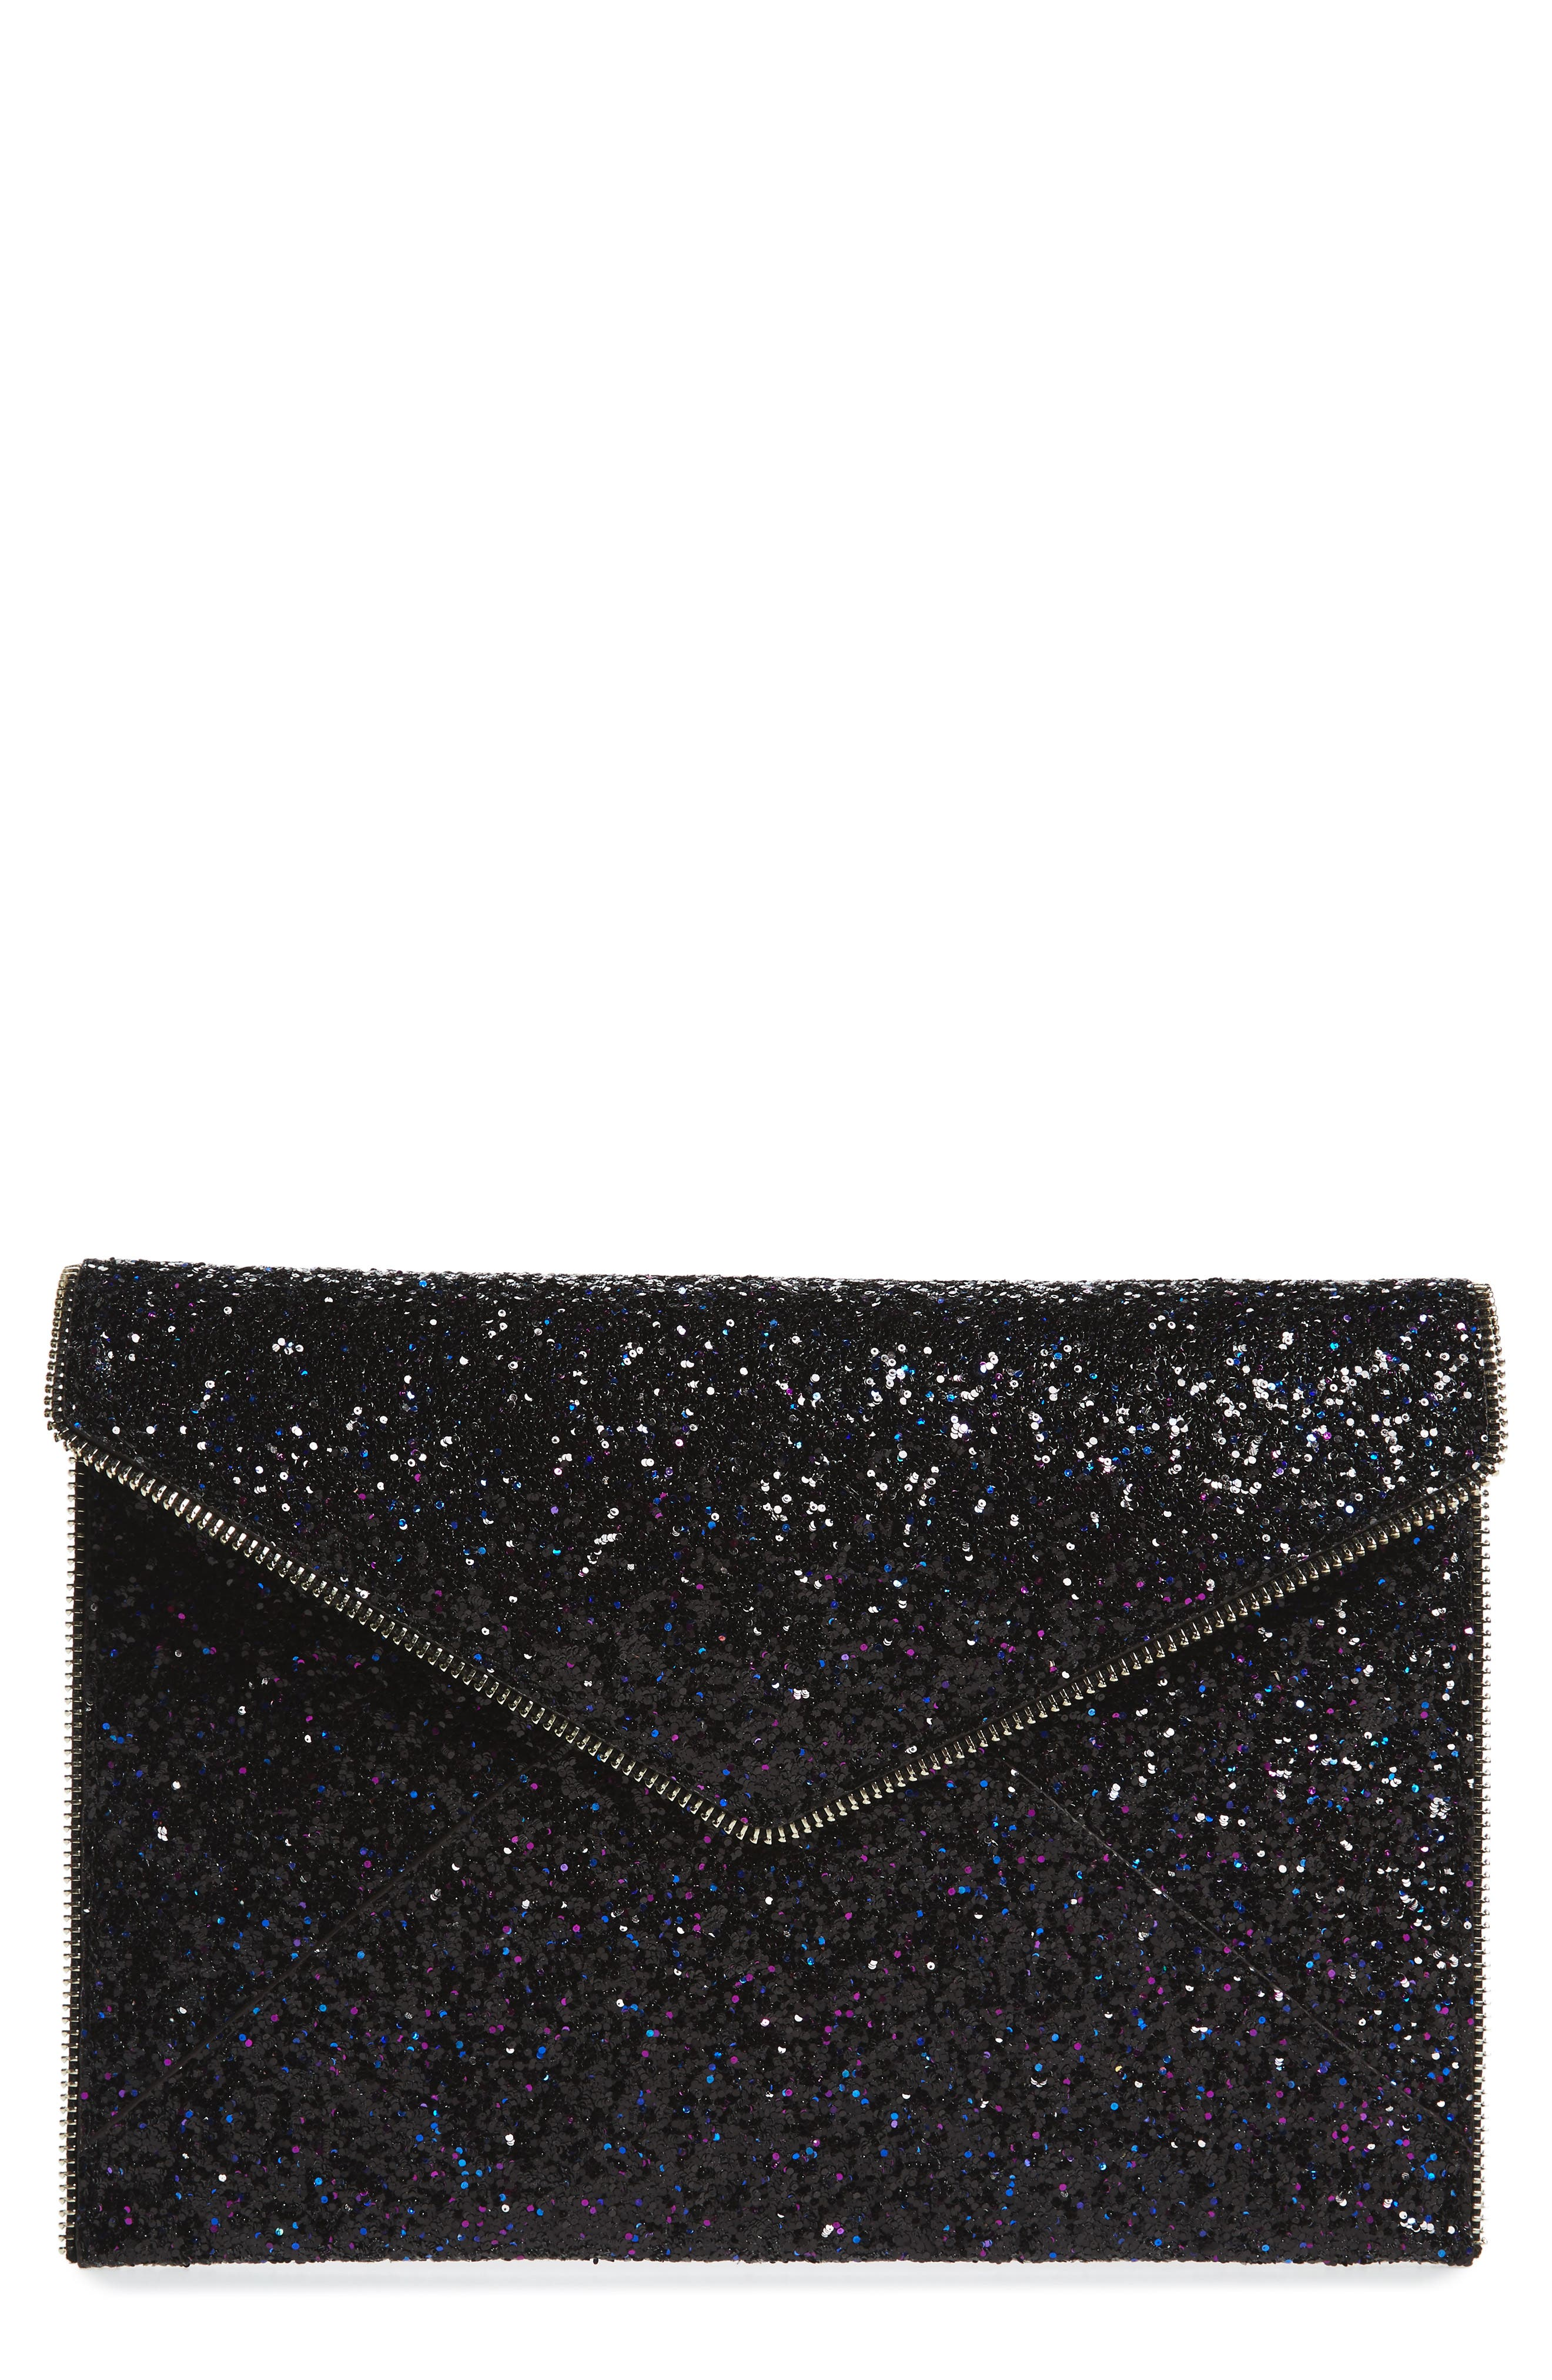 Alternate Image 1 Selected - Rebecca Minkoff Leo Glitter Envelope Clutch